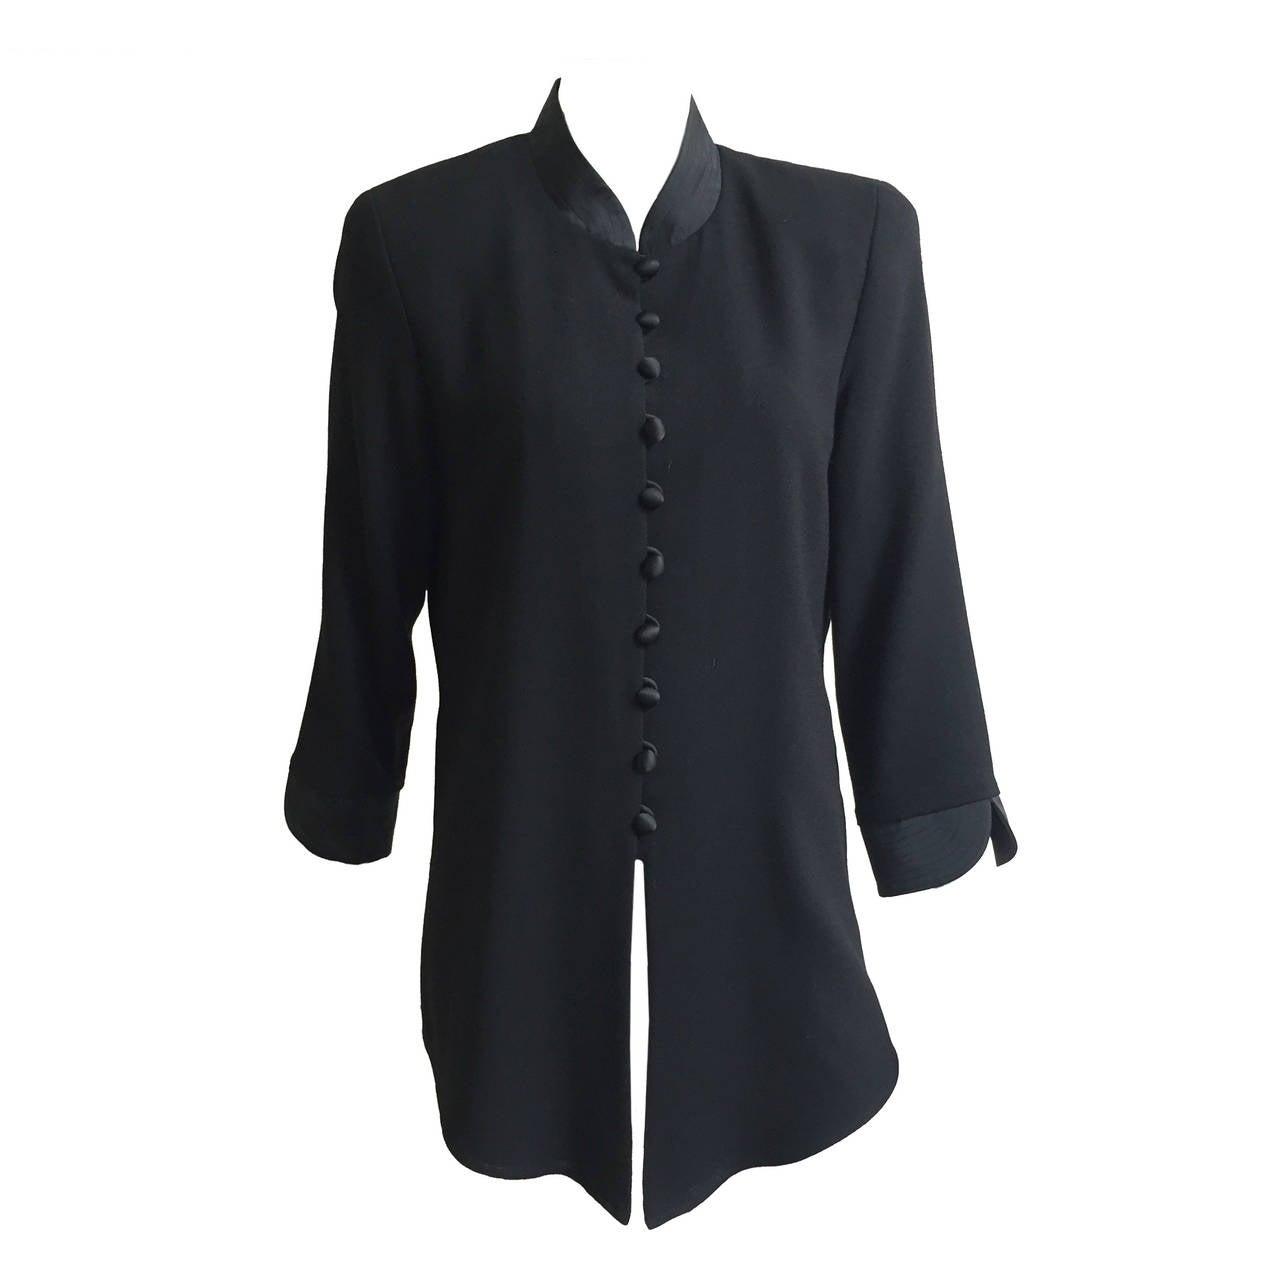 Scaasi Black Long Wool Jacket Size 10.